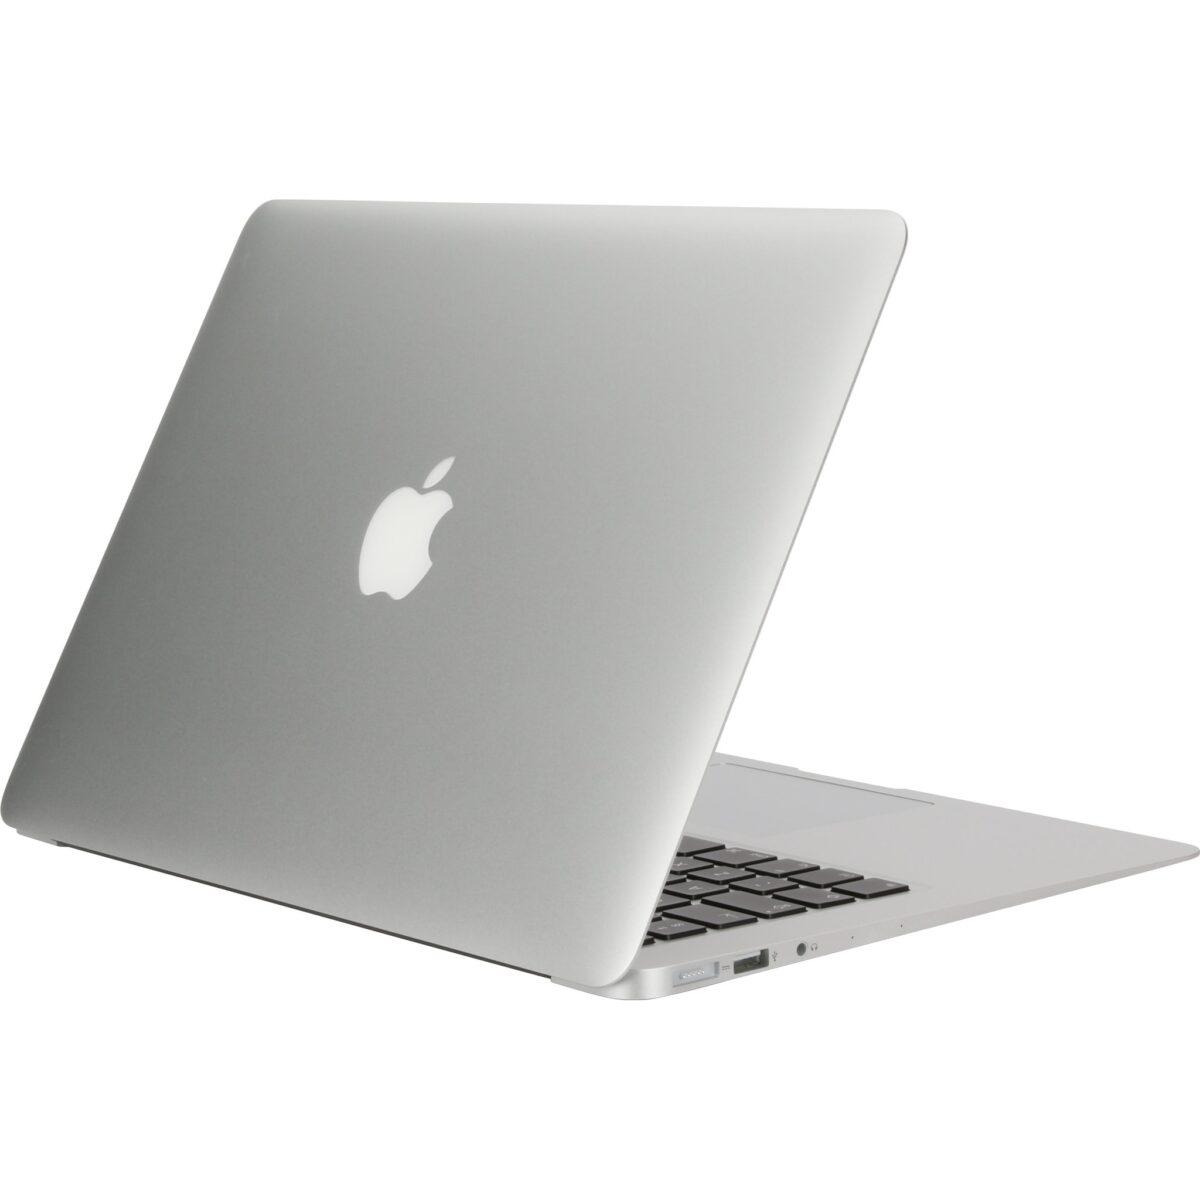 "Apple Macbook Air 2017 Powerful 13.3"" Core i5 8GB Ram 128GB SSD OS Big Sur Sale"